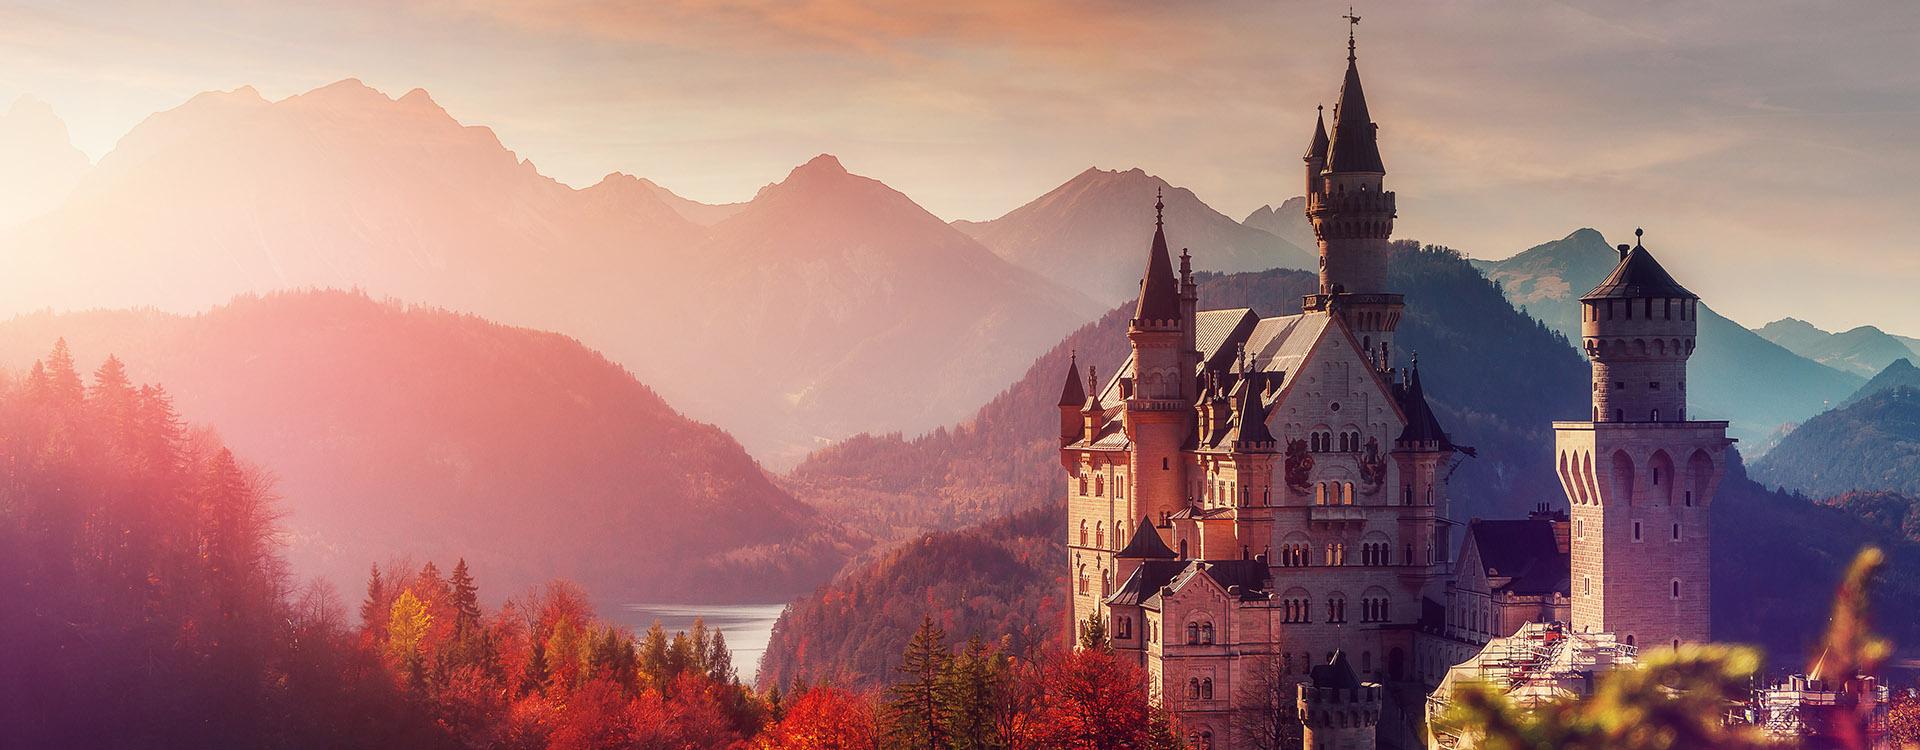 Castle near Munich in Bavaria, Germany. Natural Landscape.